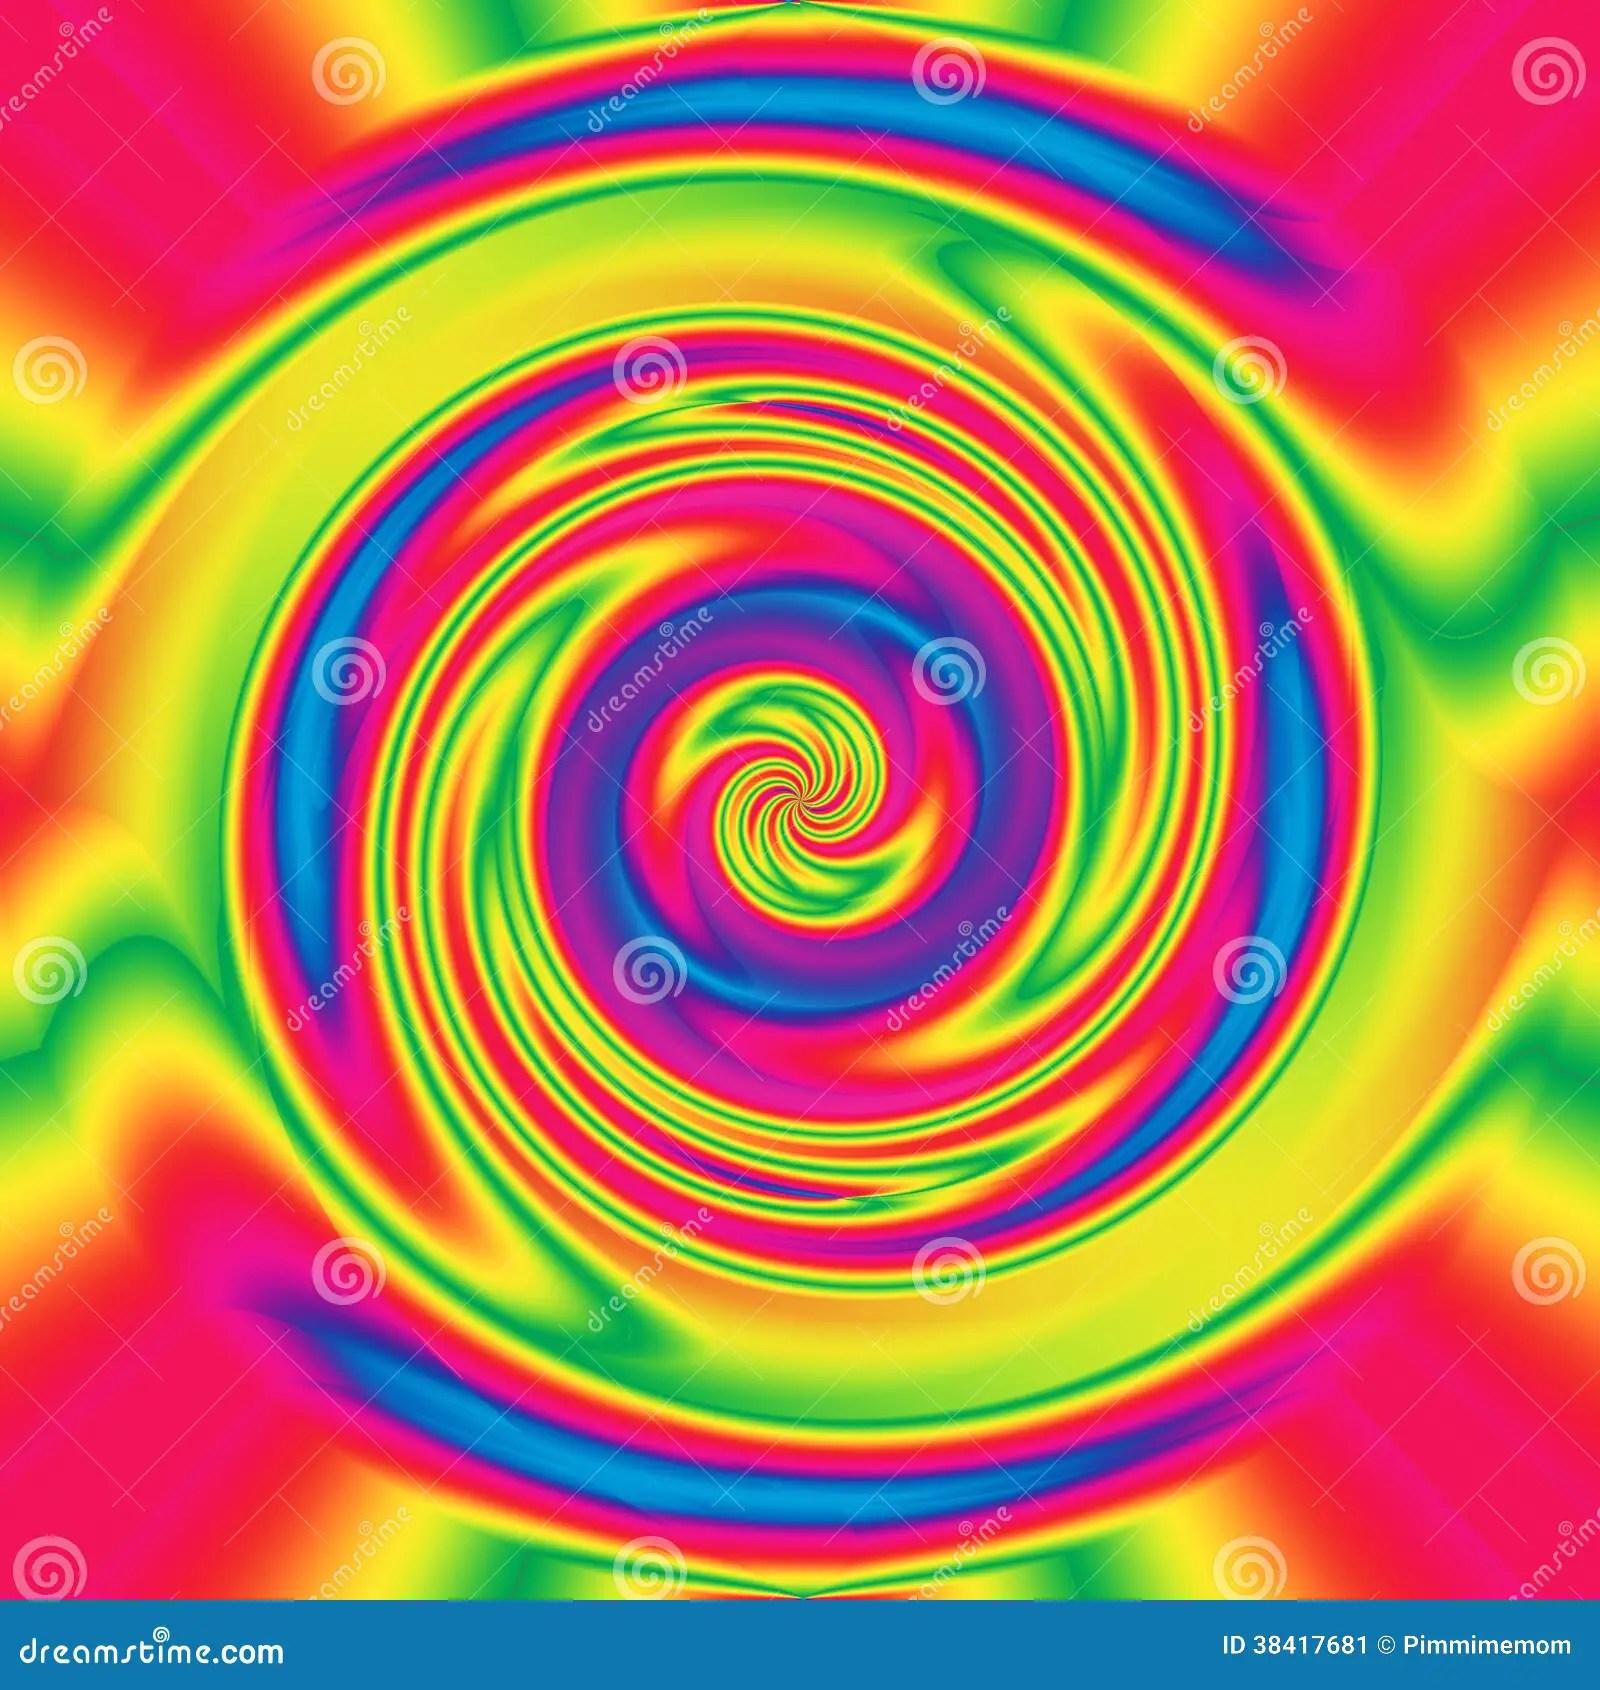 Trippy Animated Wallpapers Abstracte Hypnotiserende Draai Stock Illustratie